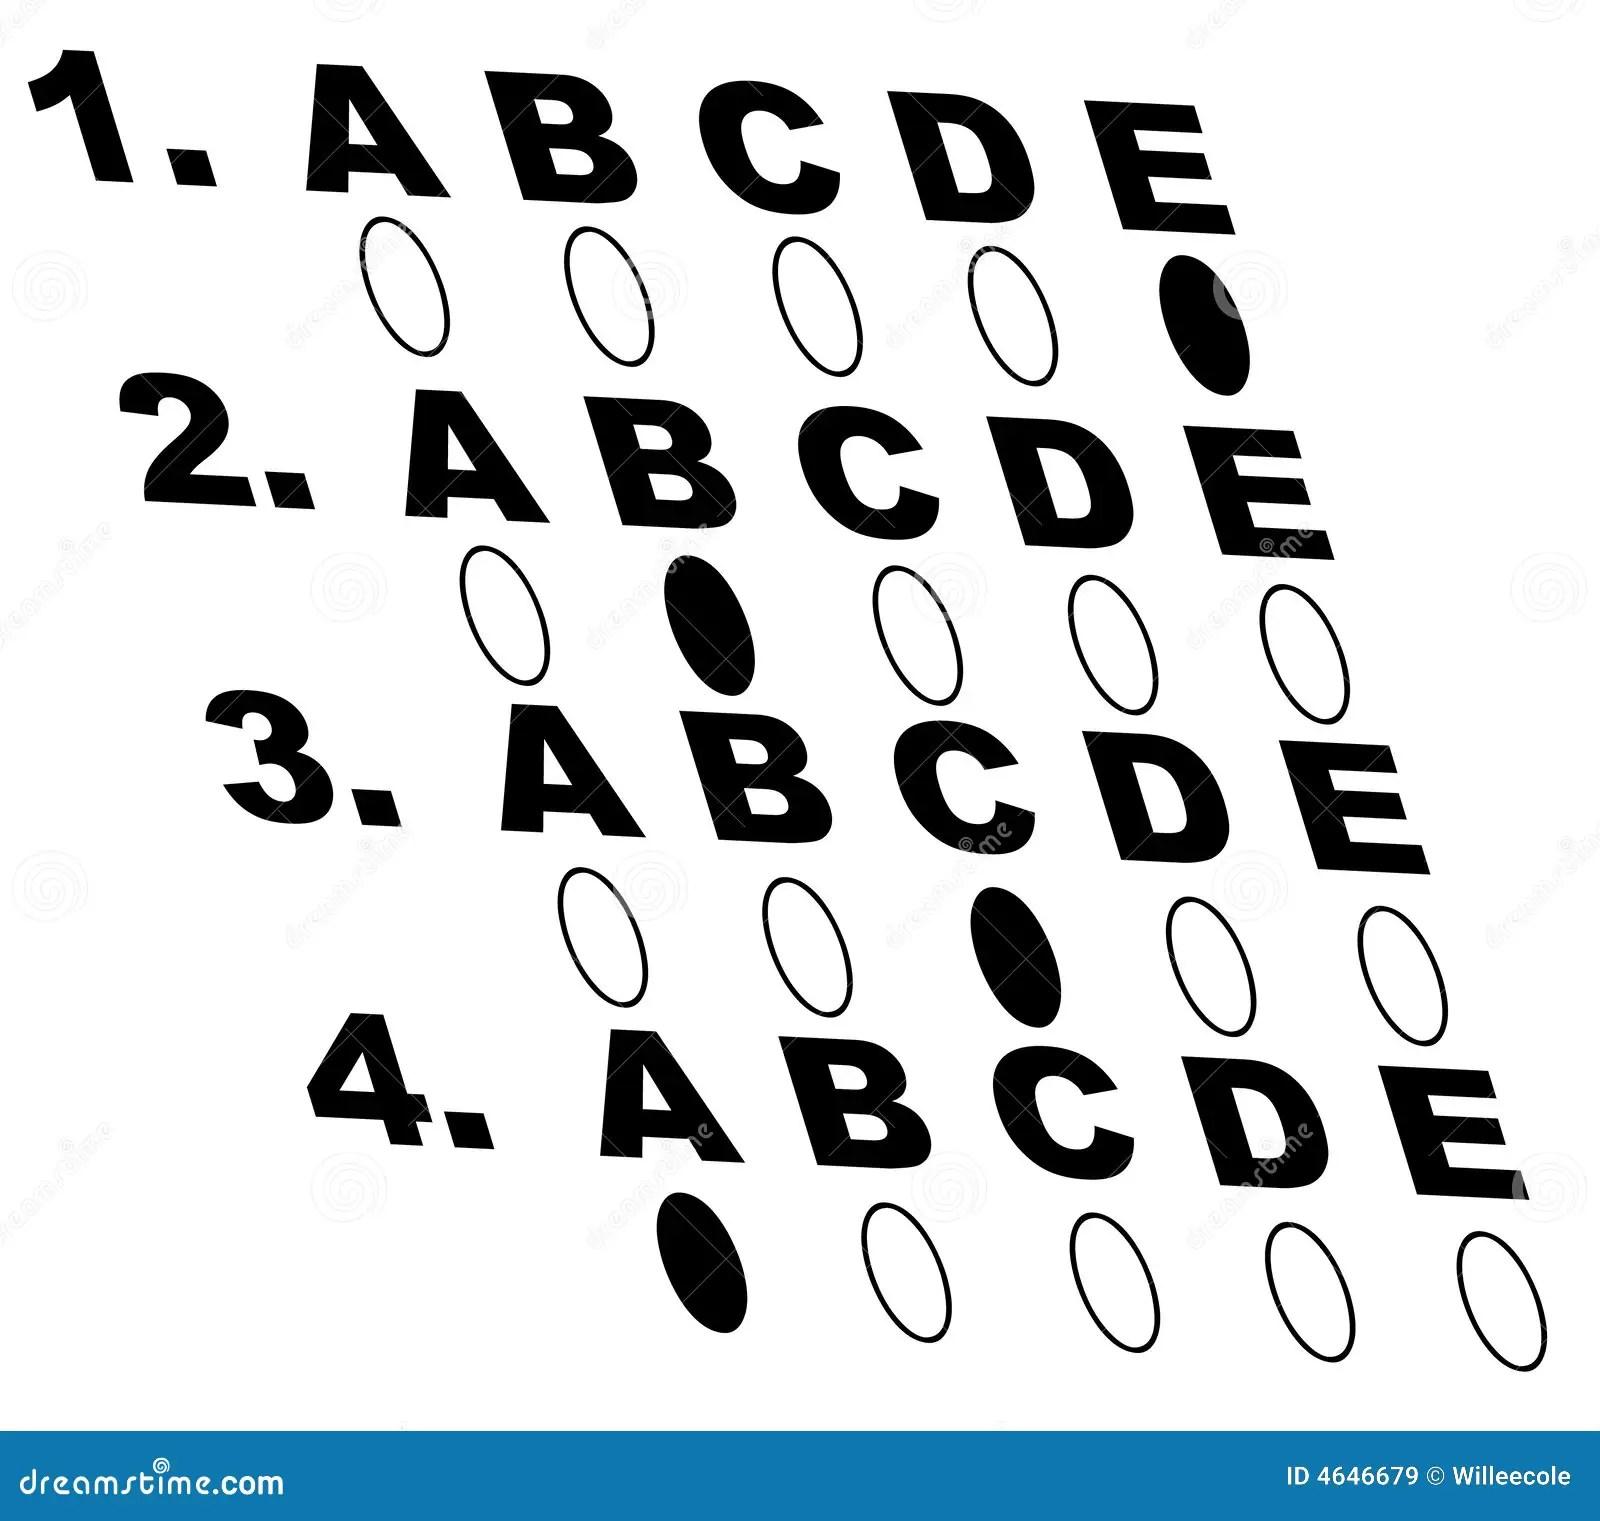 Multiple choice test stock vector. Illustration of